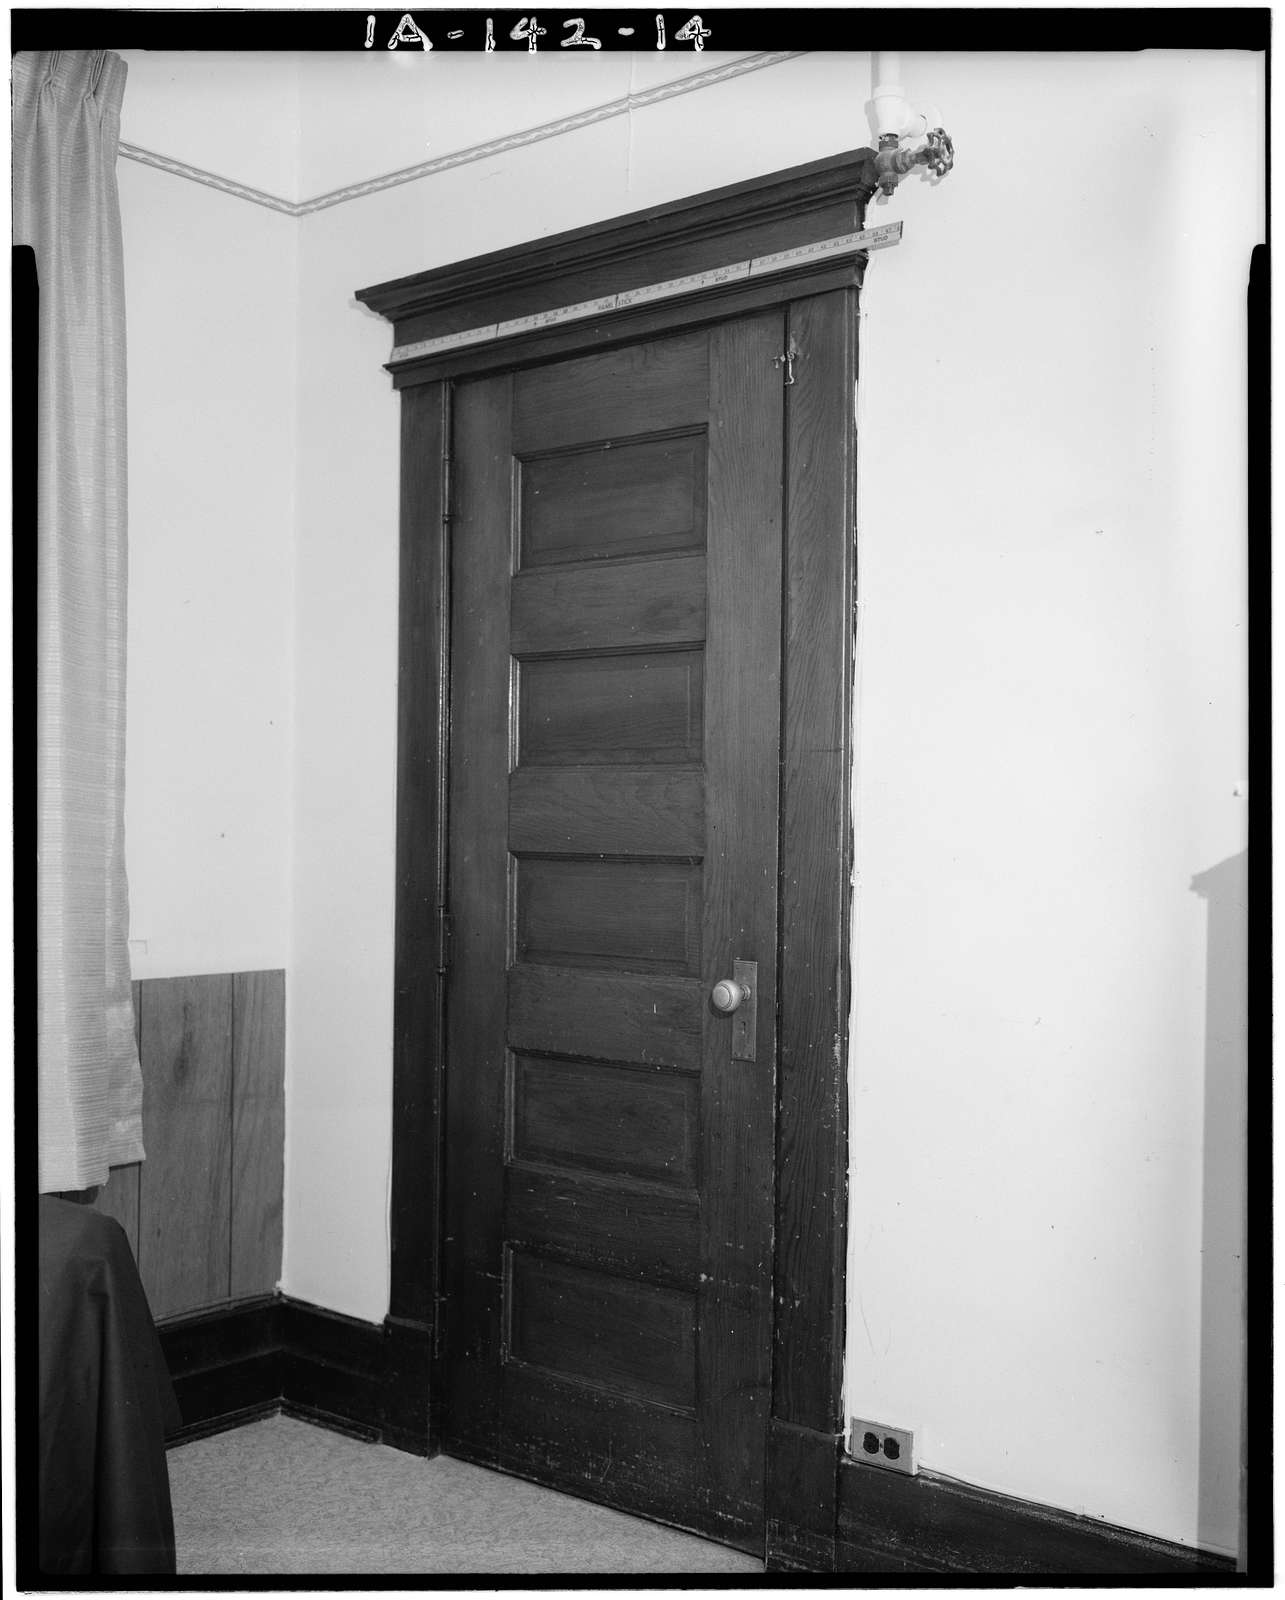 Hershey Memorial Hospital, 1810 Mulberry Avenue, Muscatine, Muscatine County, IA